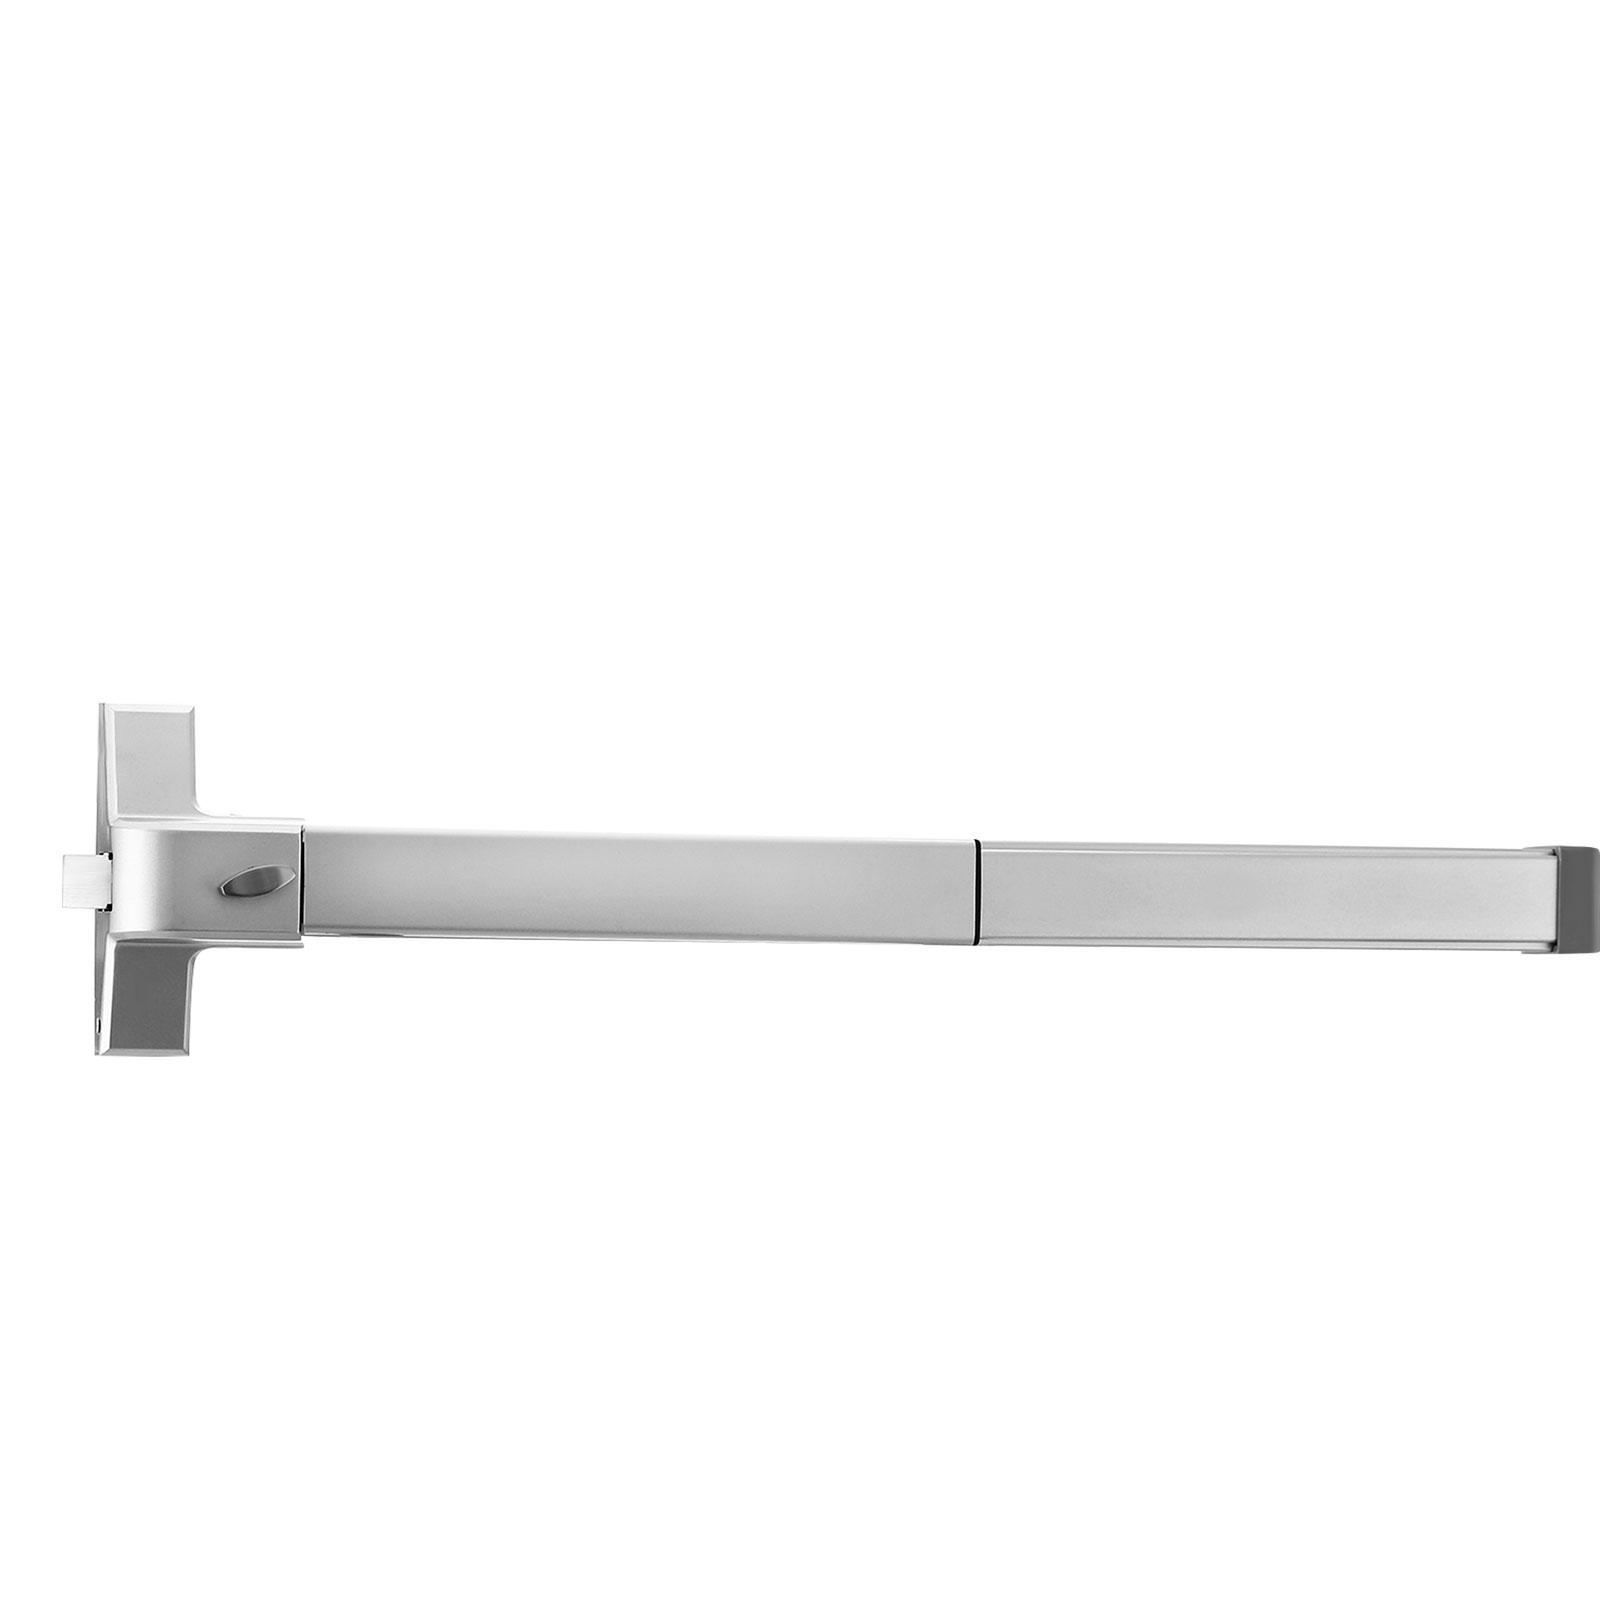 Door Push Bar Exit Panic Device Lock Emergency Hardware